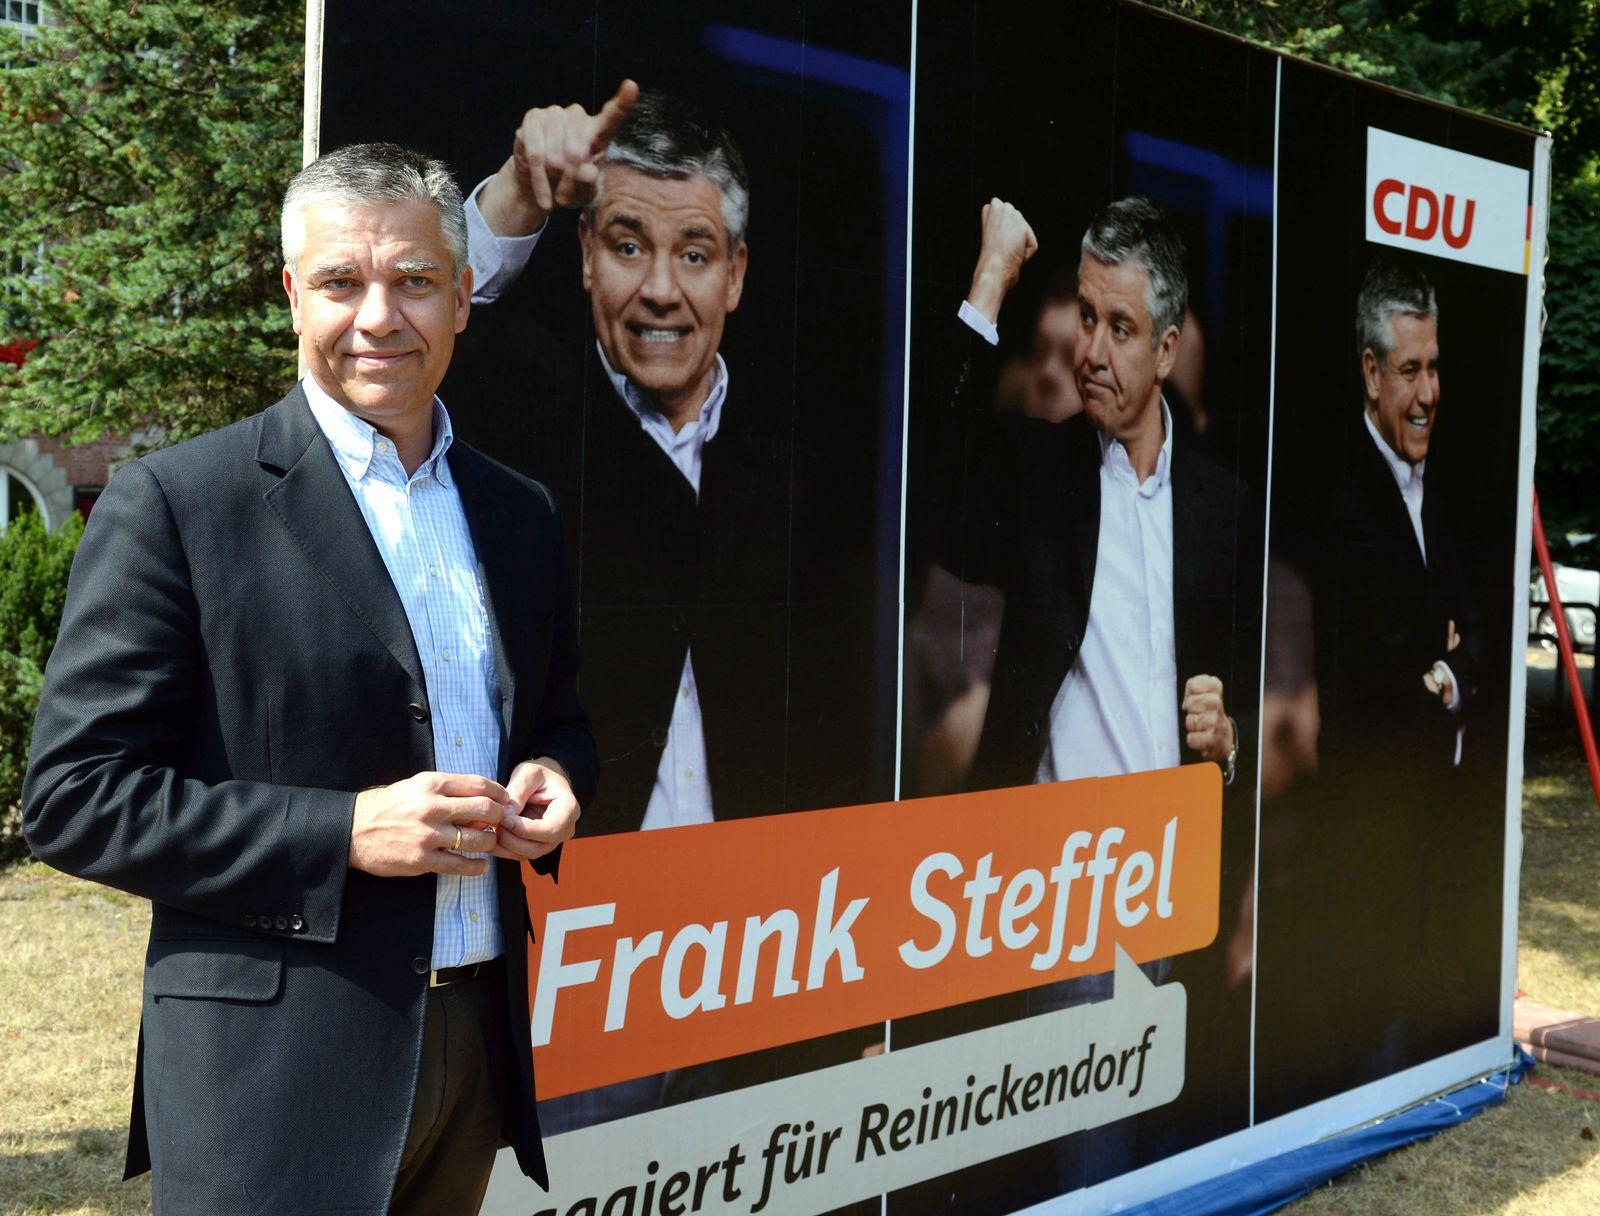 Frank Steffel CDU Berlin